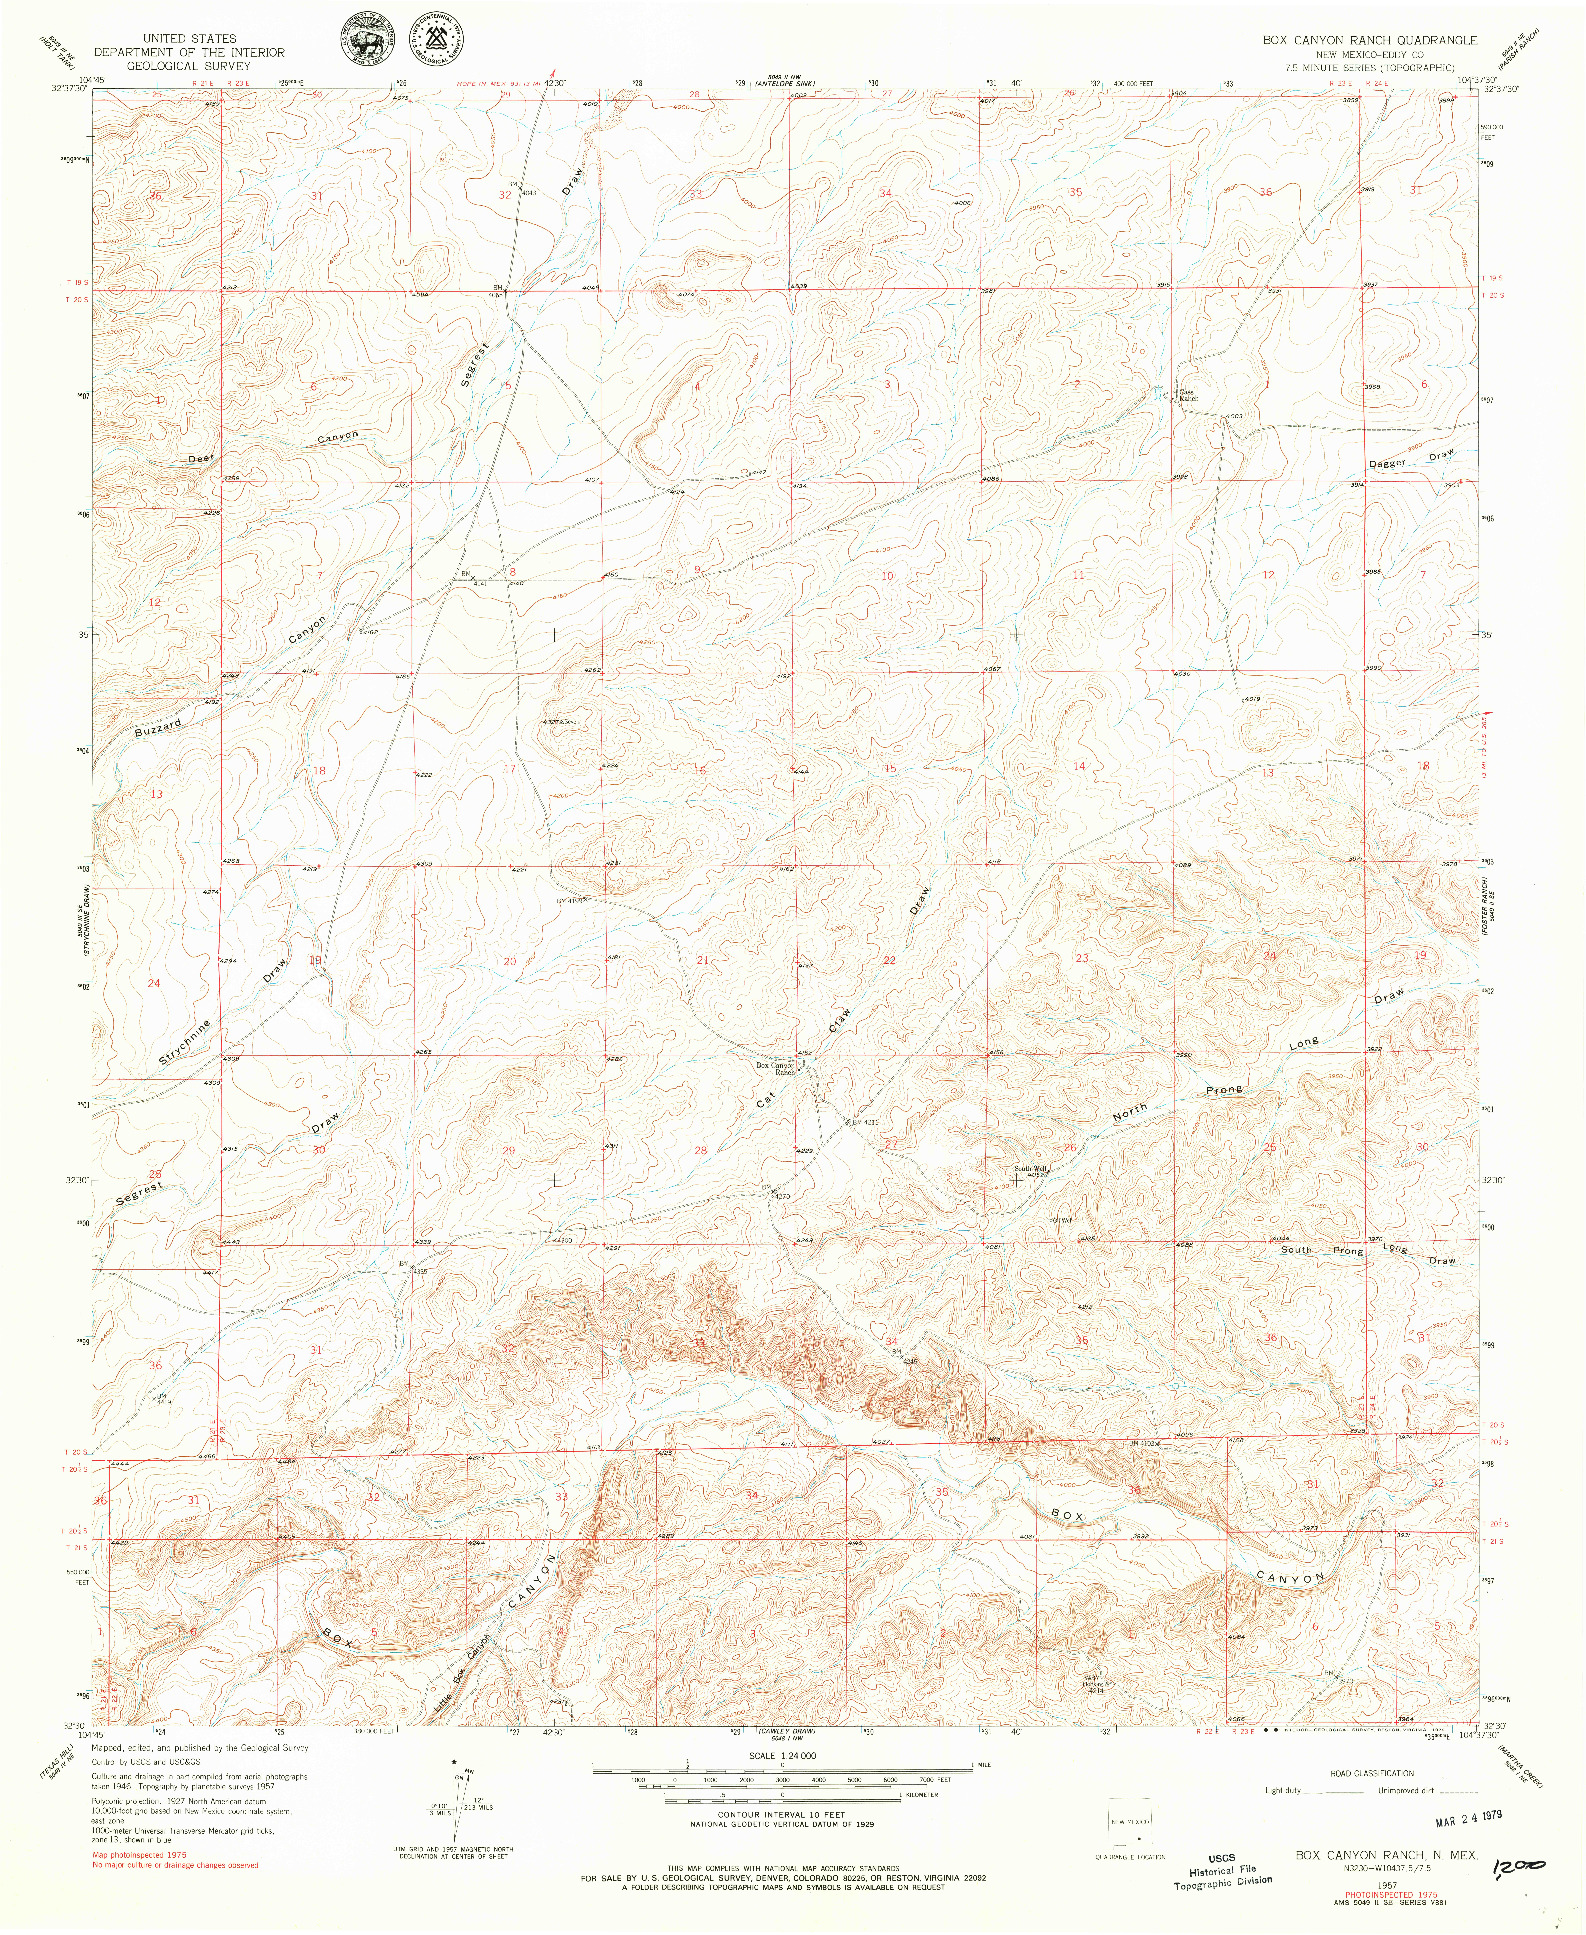 USGS 1:24000-SCALE QUADRANGLE FOR BOX CANYON RANCH, NM 1957